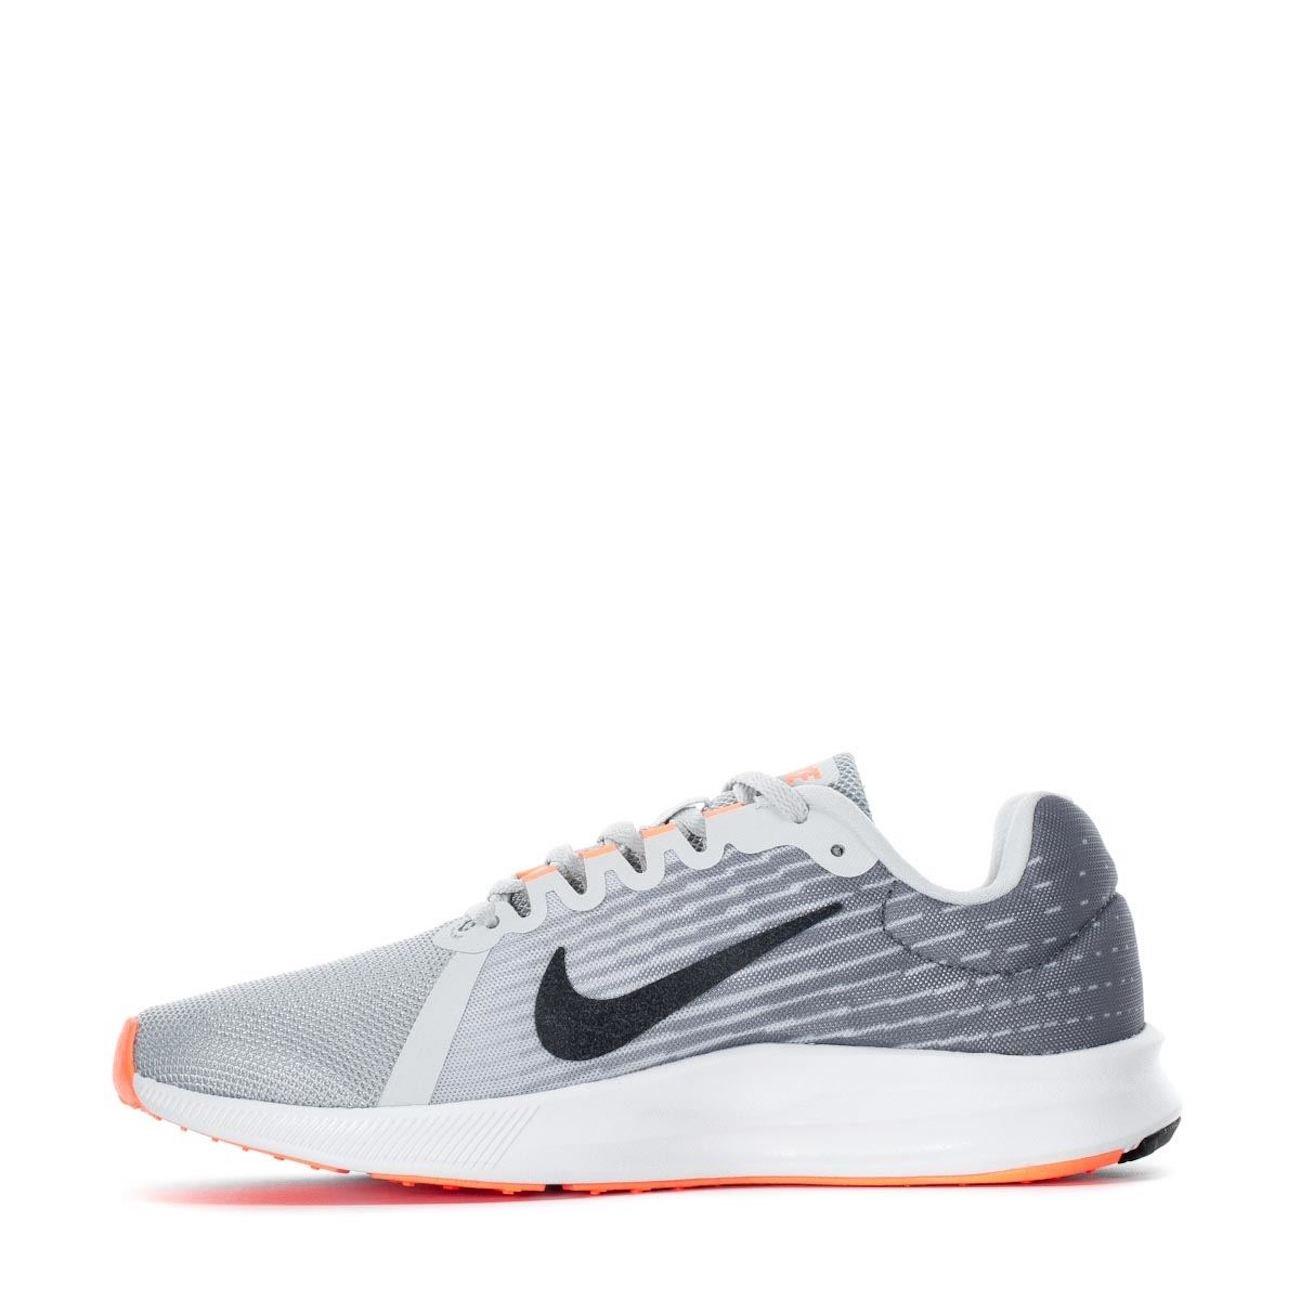 NIKE Women's Downshifter 8 M Running Shoe B078NH2SKV 10 M 8 US|Pure Platinum/Obsidian/Ashen Slate b80762